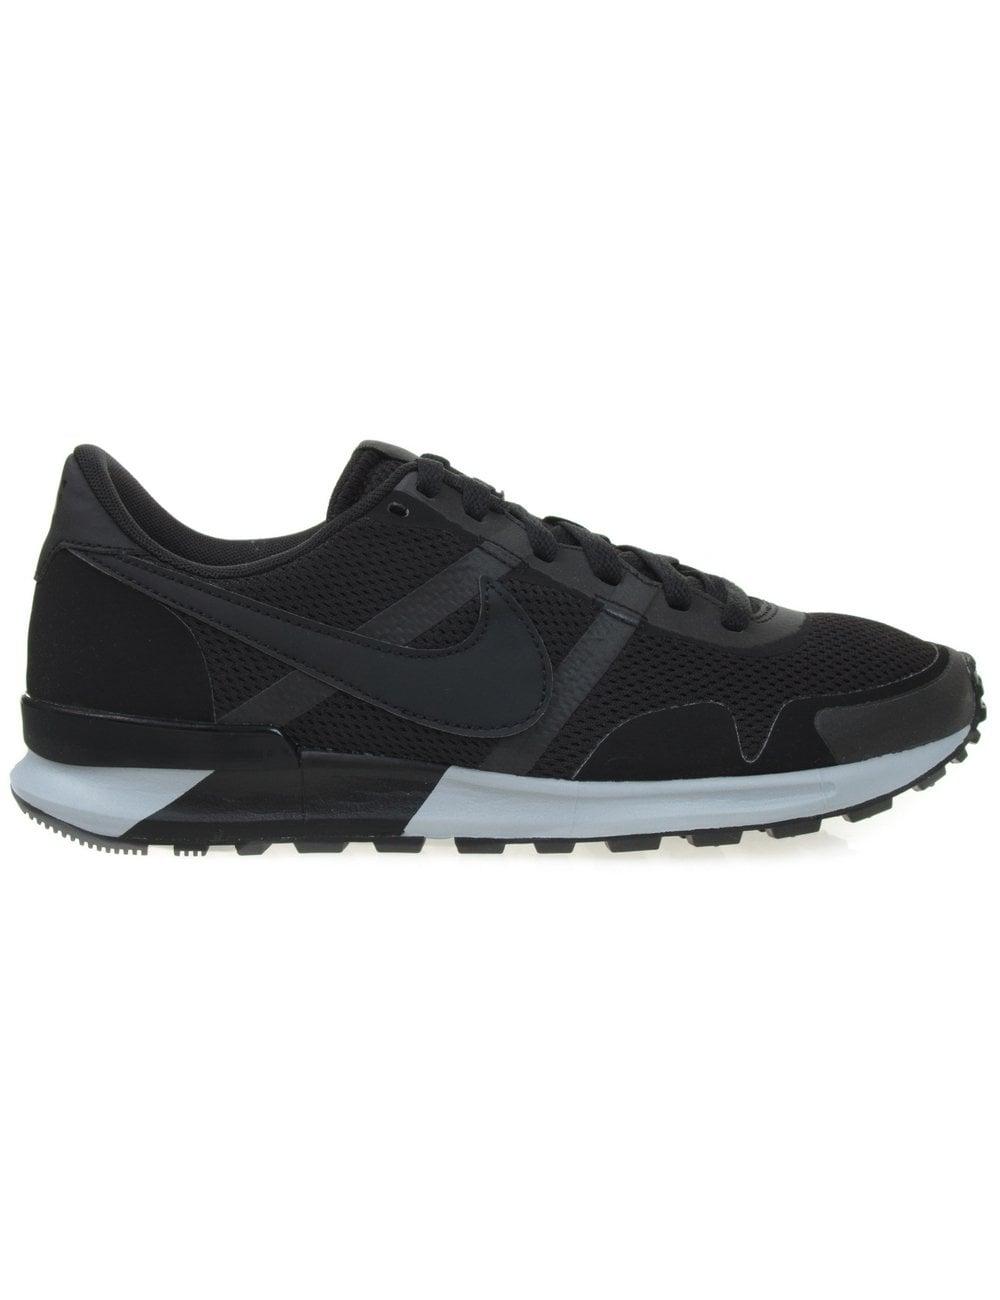 22f470330d67 Nike Air Pegasus 83 30 - All Black - Footwear from Fat Buddha Store UK